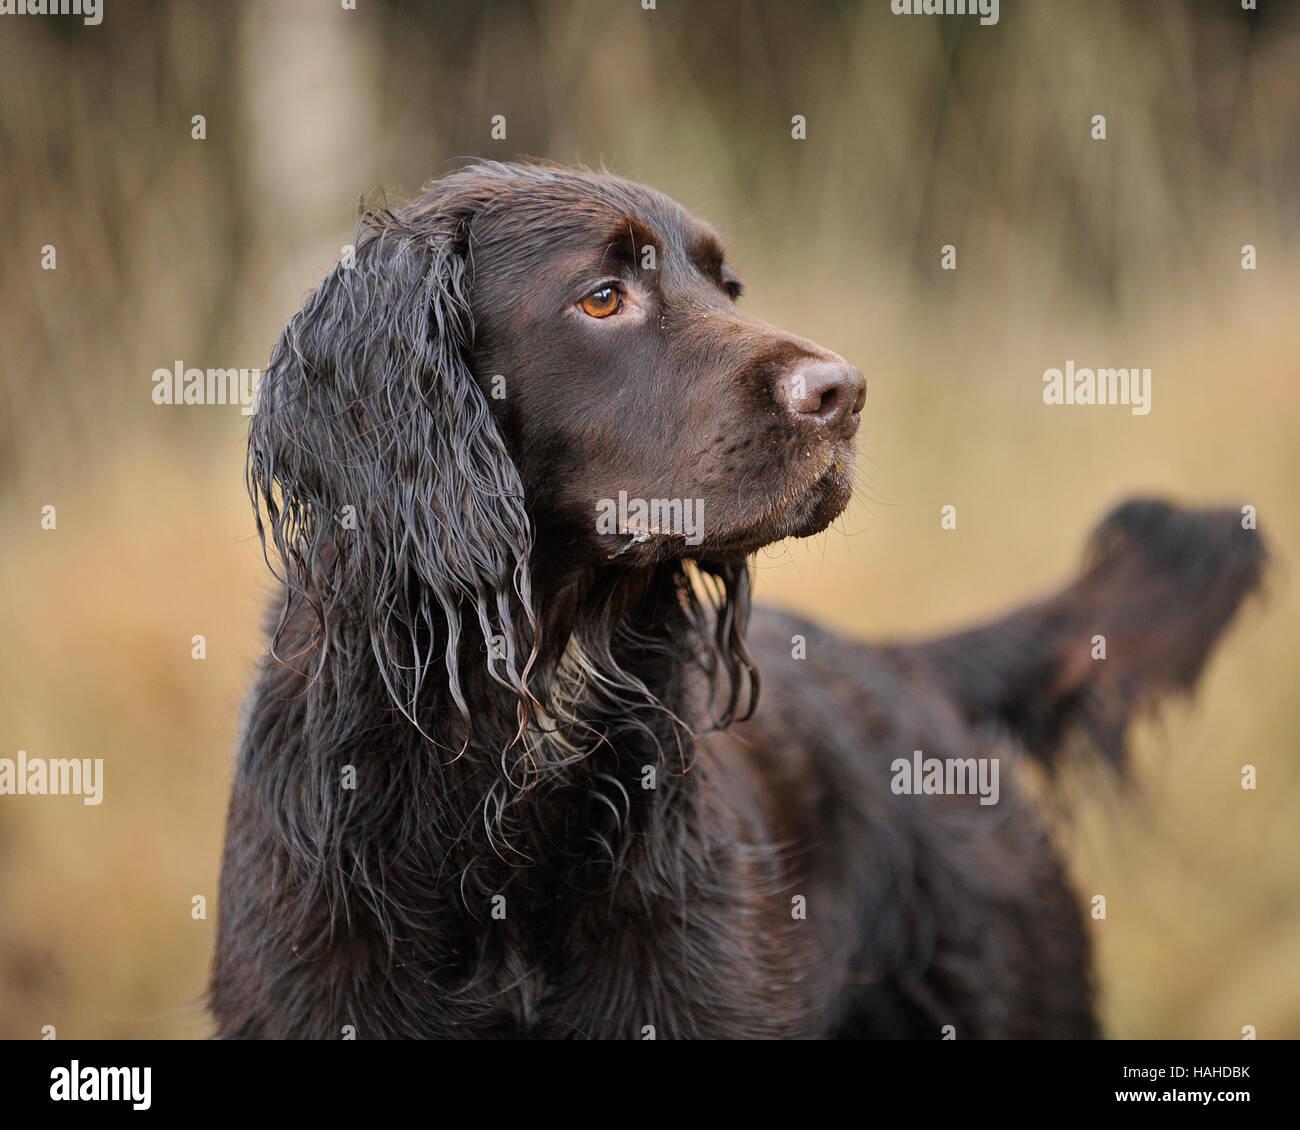 springer x labrador working gundog, male - Stock Image